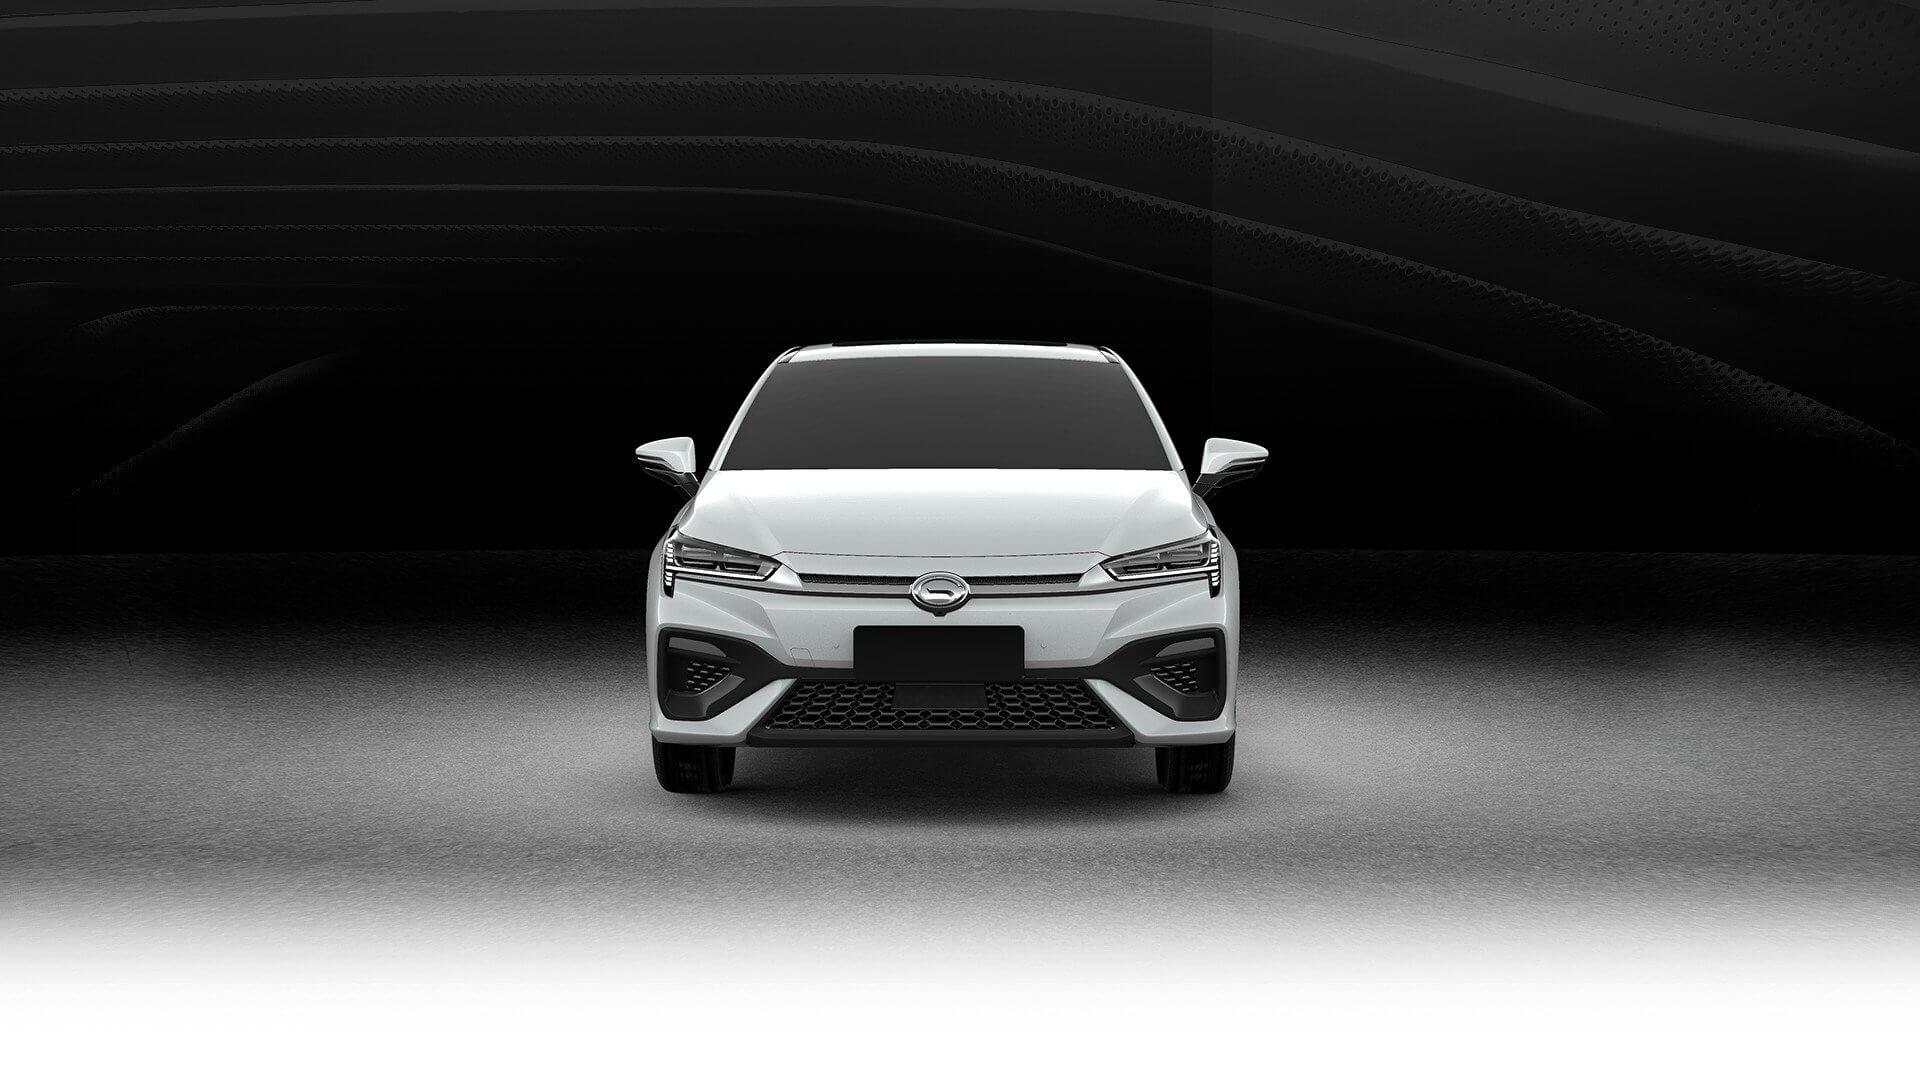 Электрический седан GAC Aion S - вид спереди